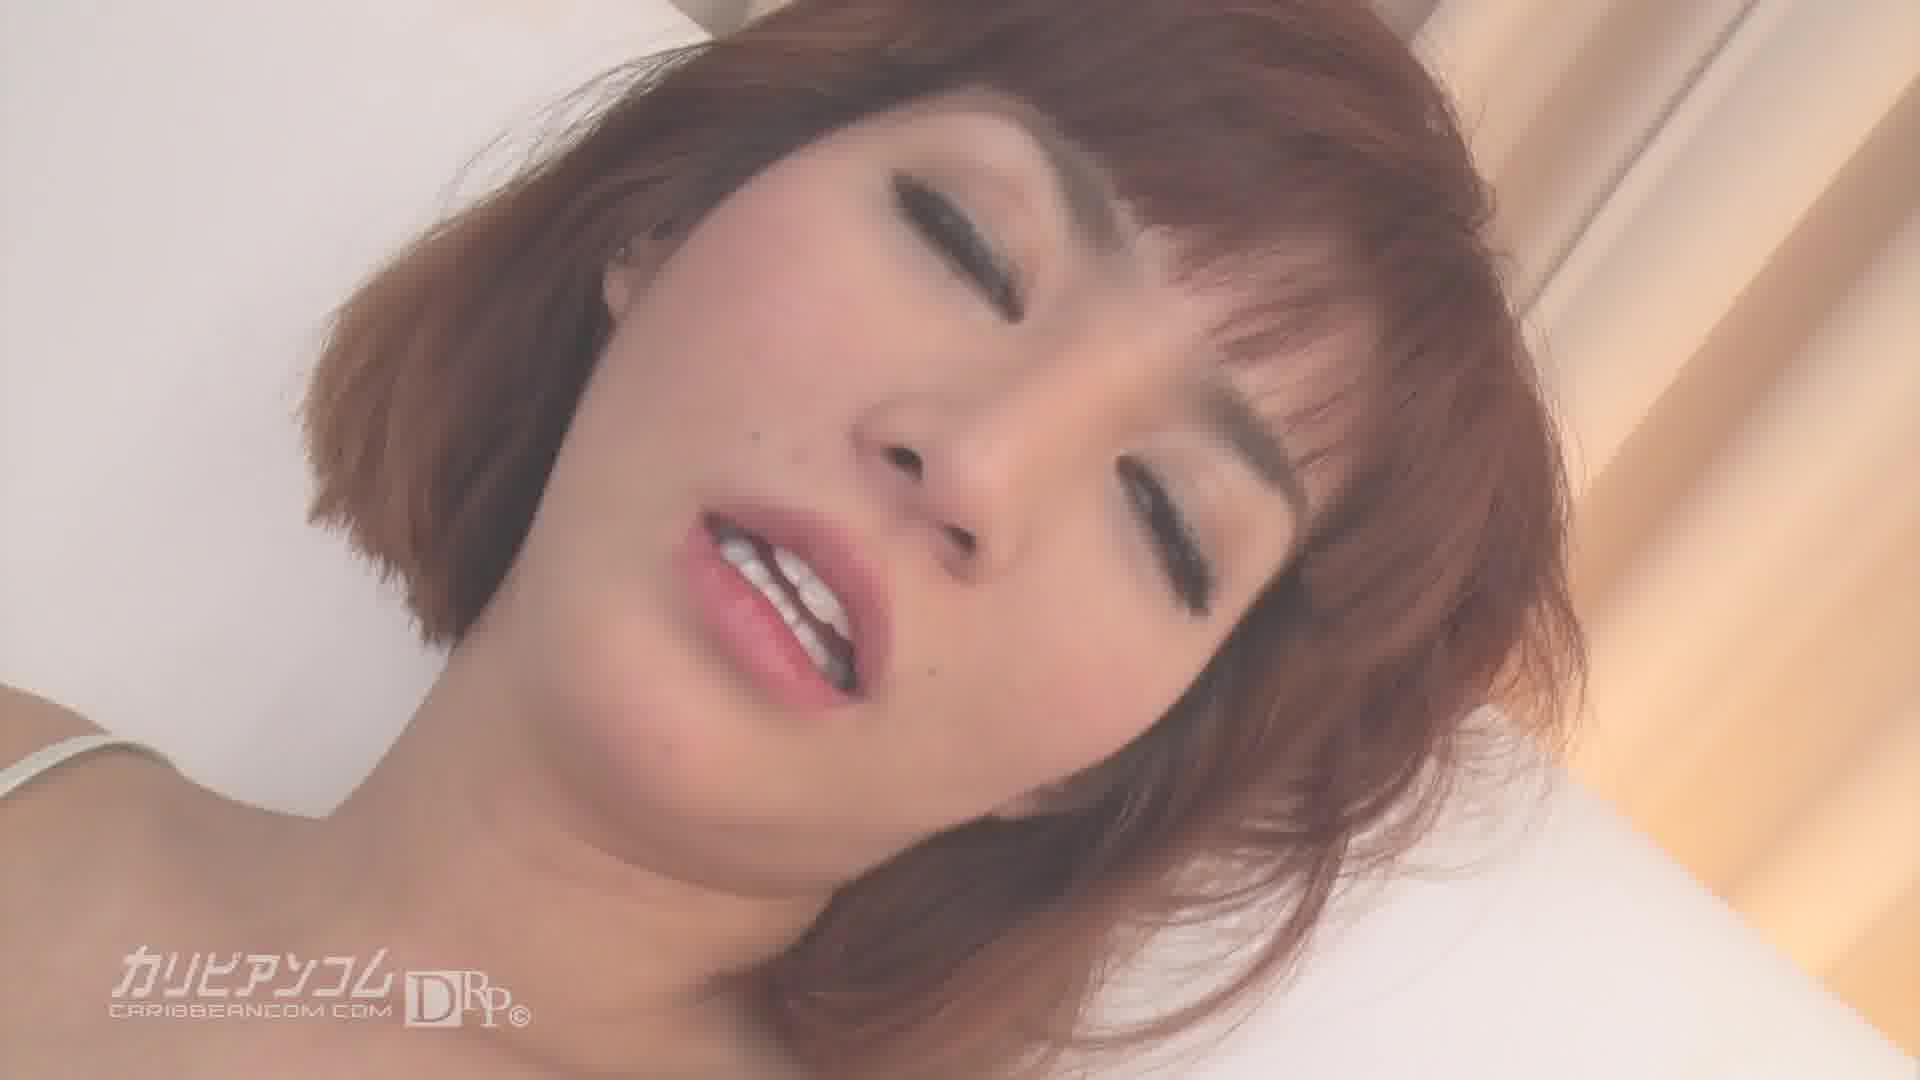 痴女帝降臨 - 麻生希【ギャル・巨乳・痴女】